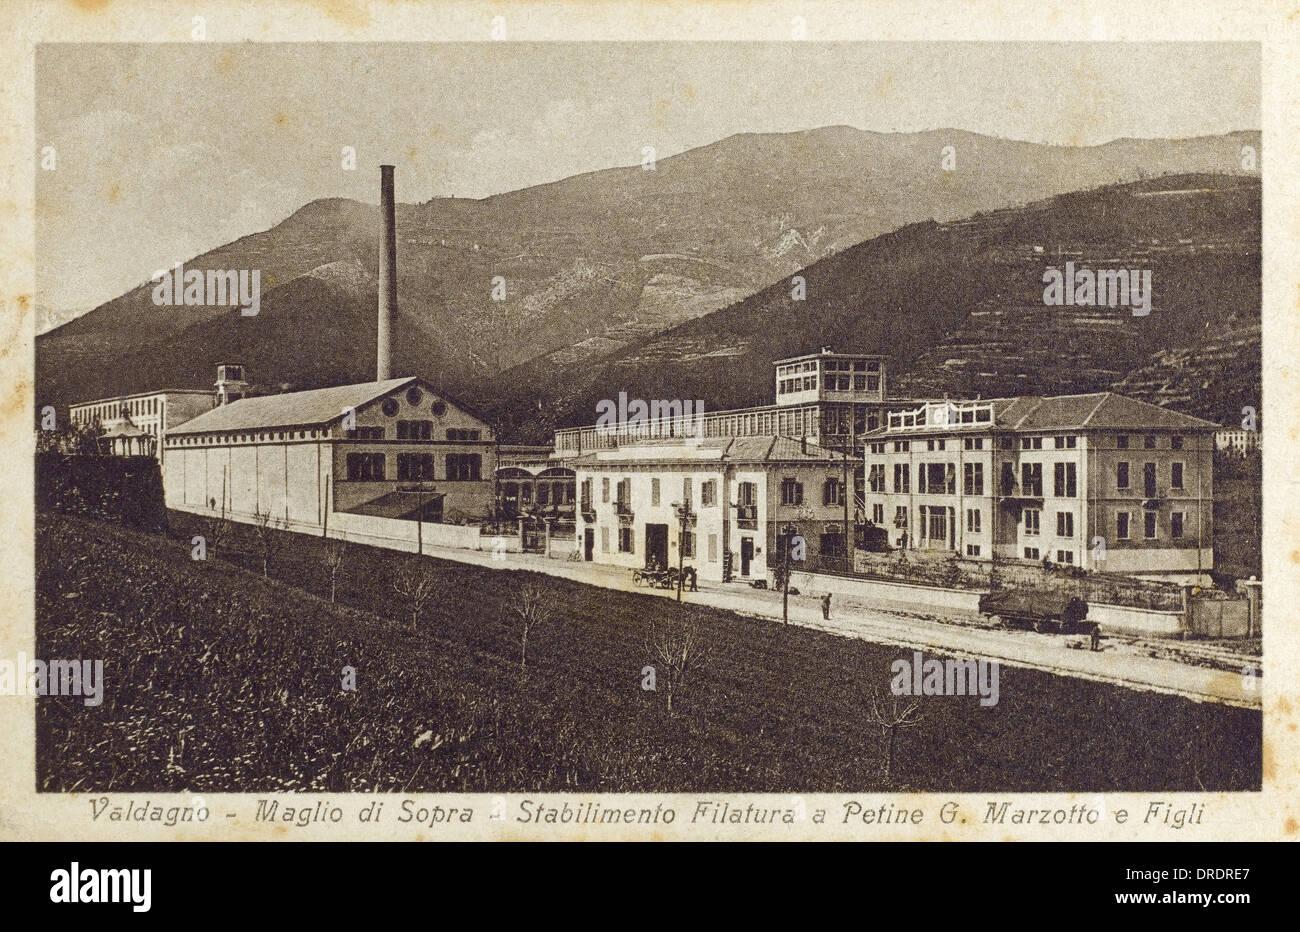 Valdagno, Italy - Textile Factory - Stock Image